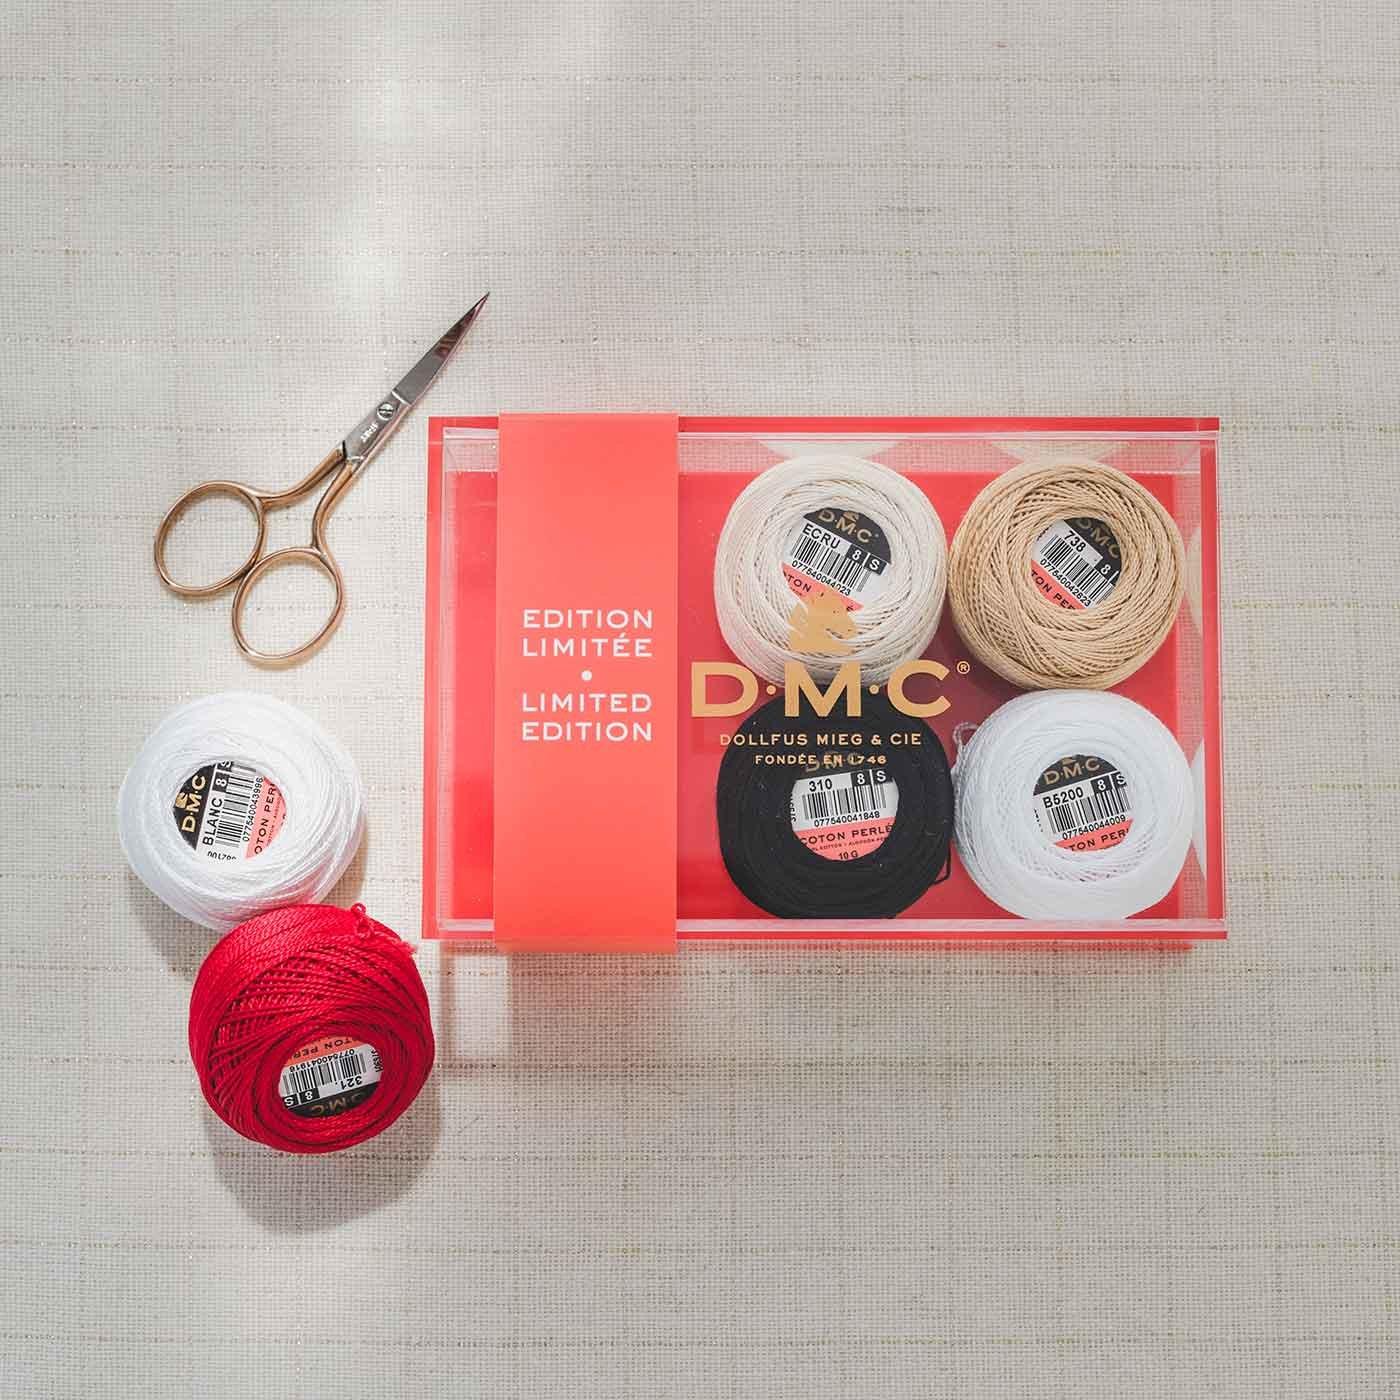 DMC クリアケース入り 8番糸コットンパール刺しゅう糸